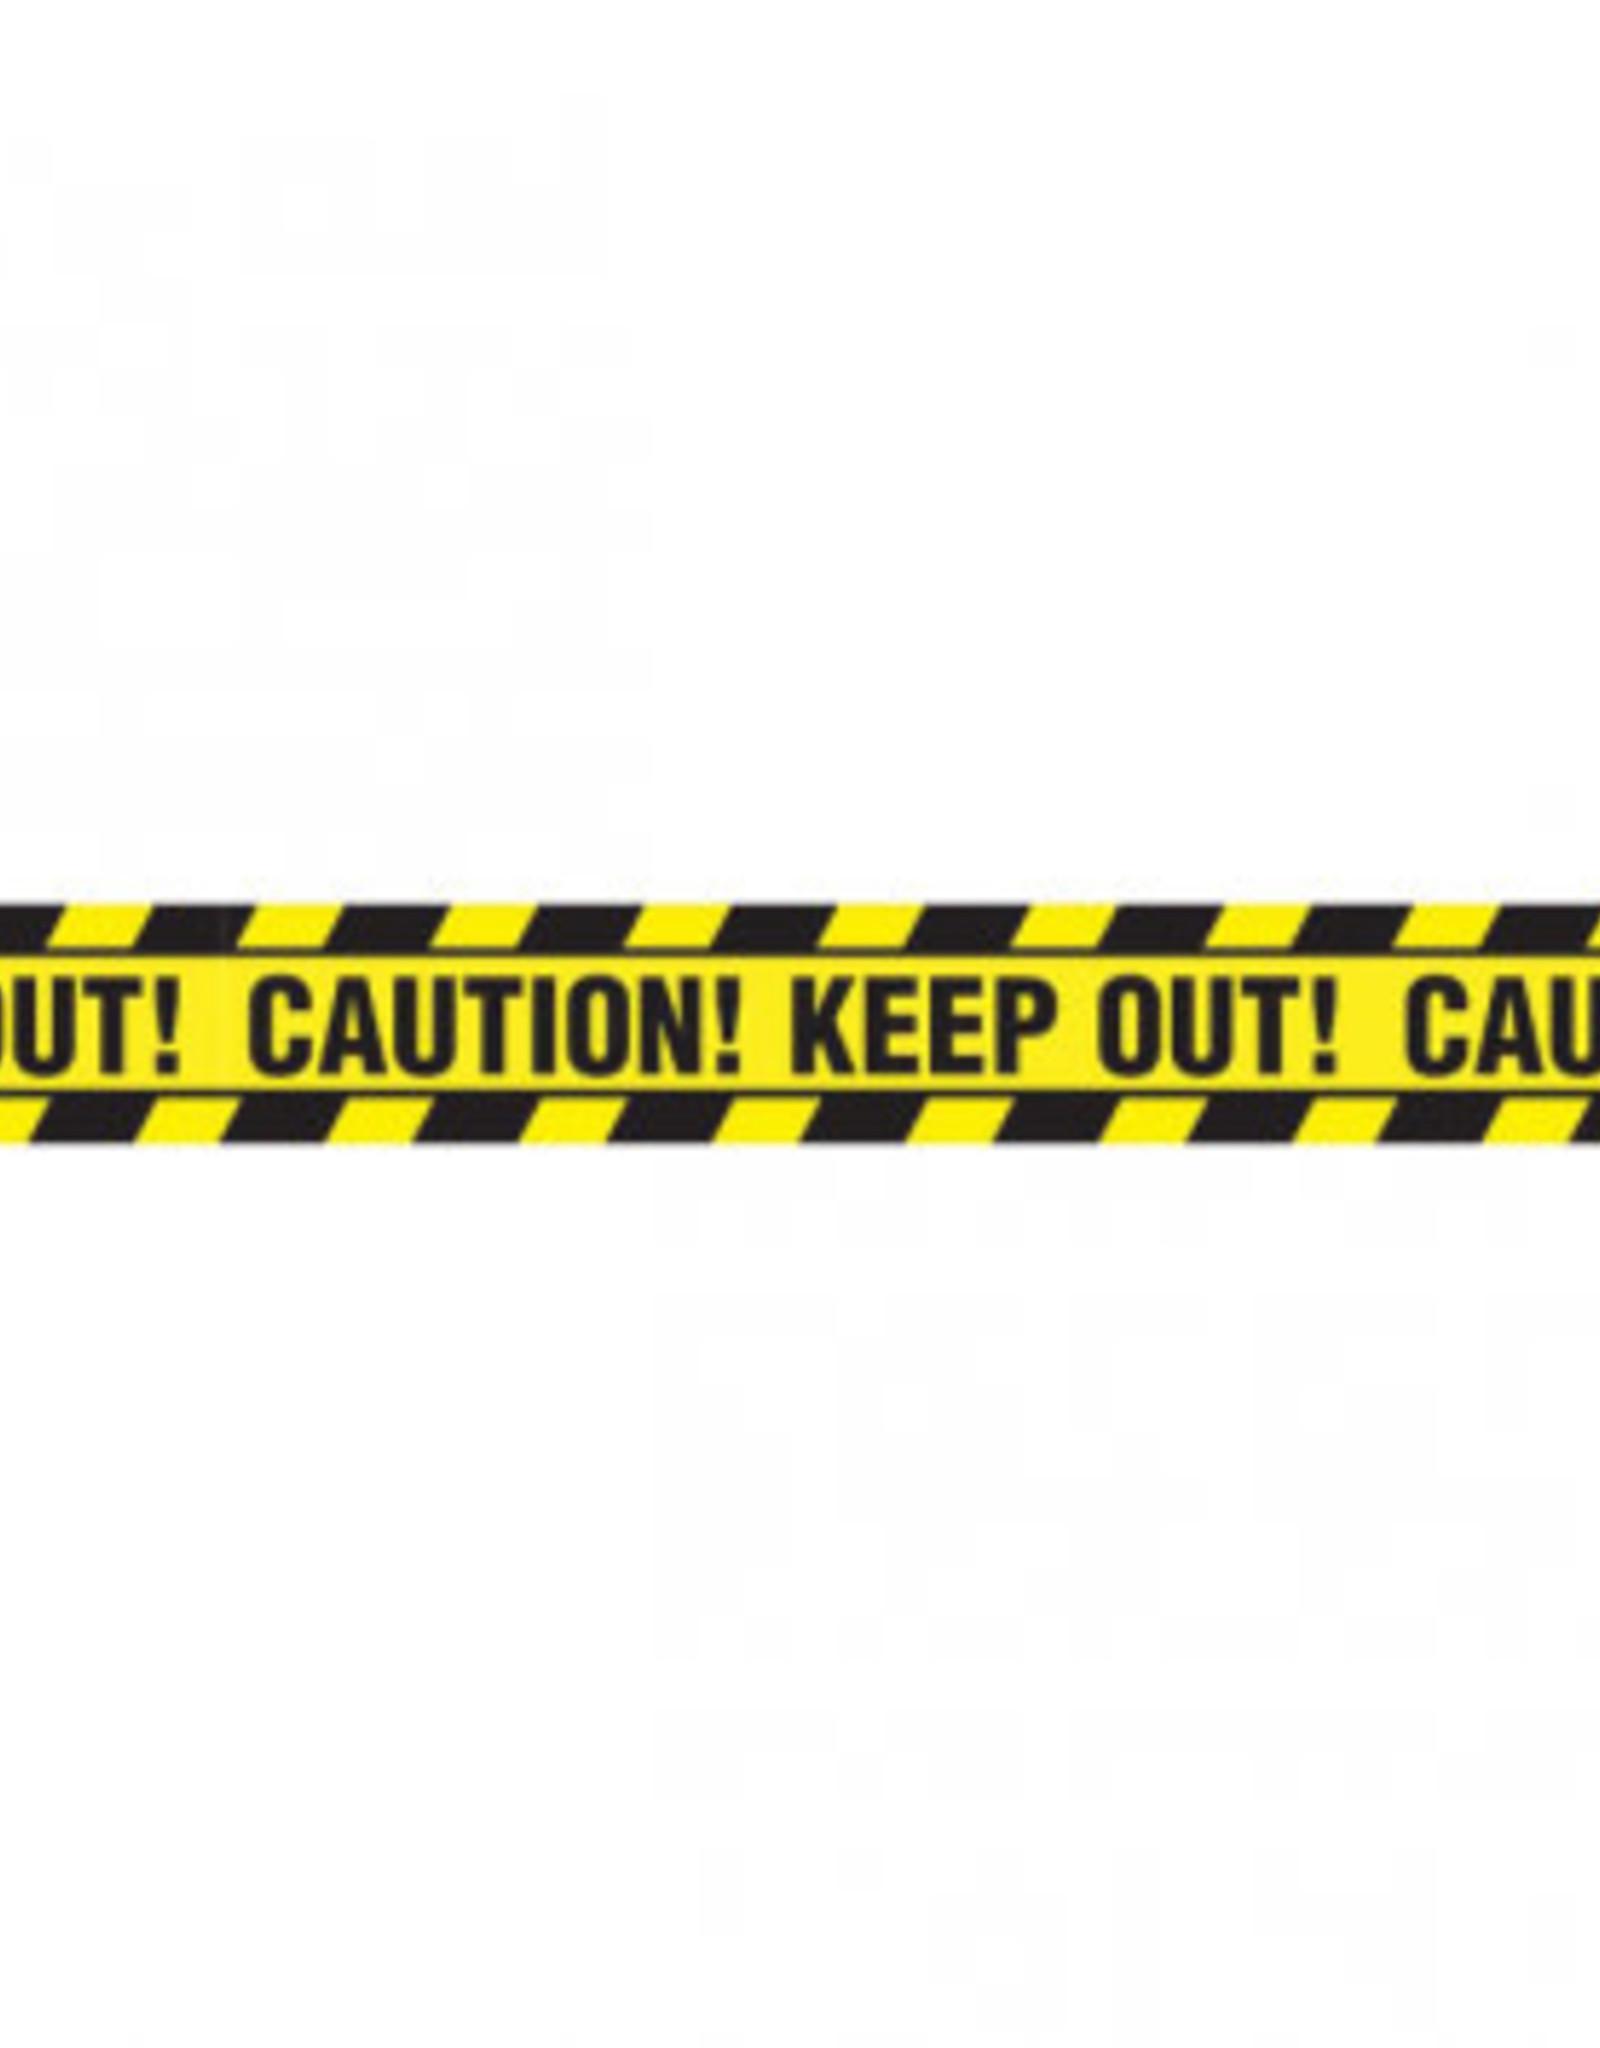 Caution Tape 20ft